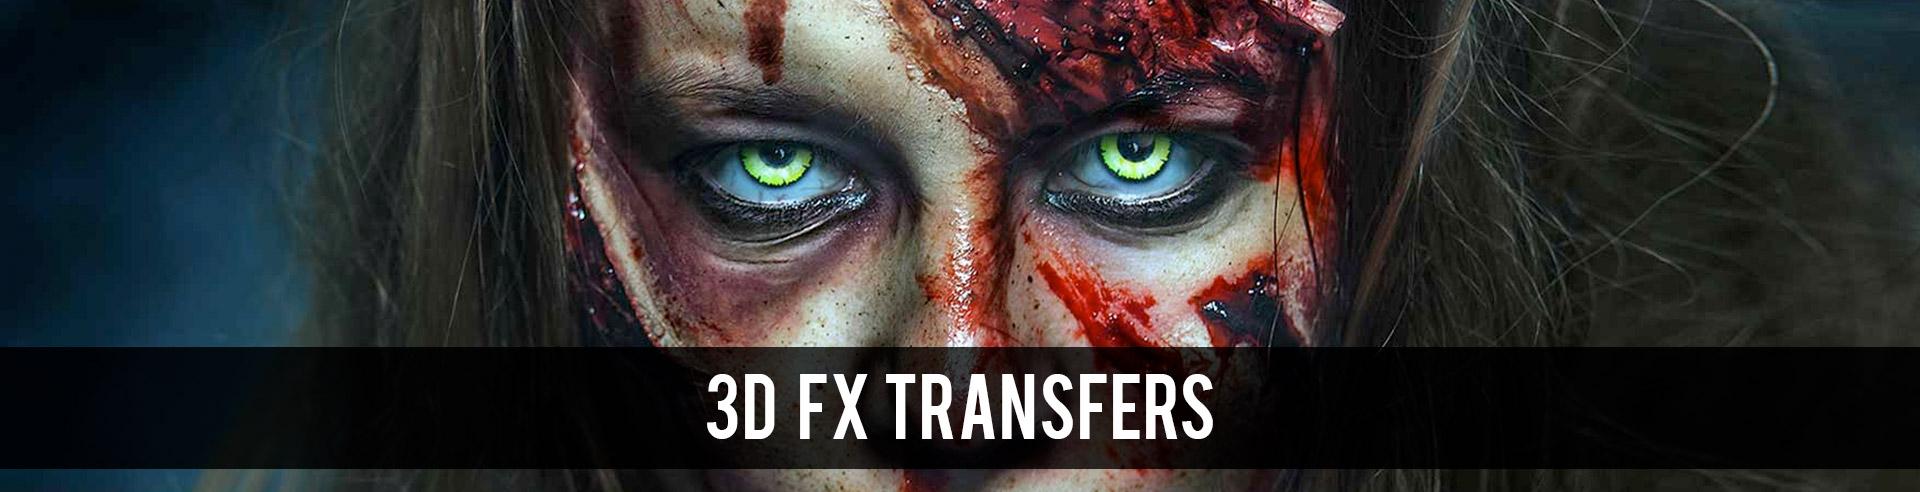 3D FX Transfers